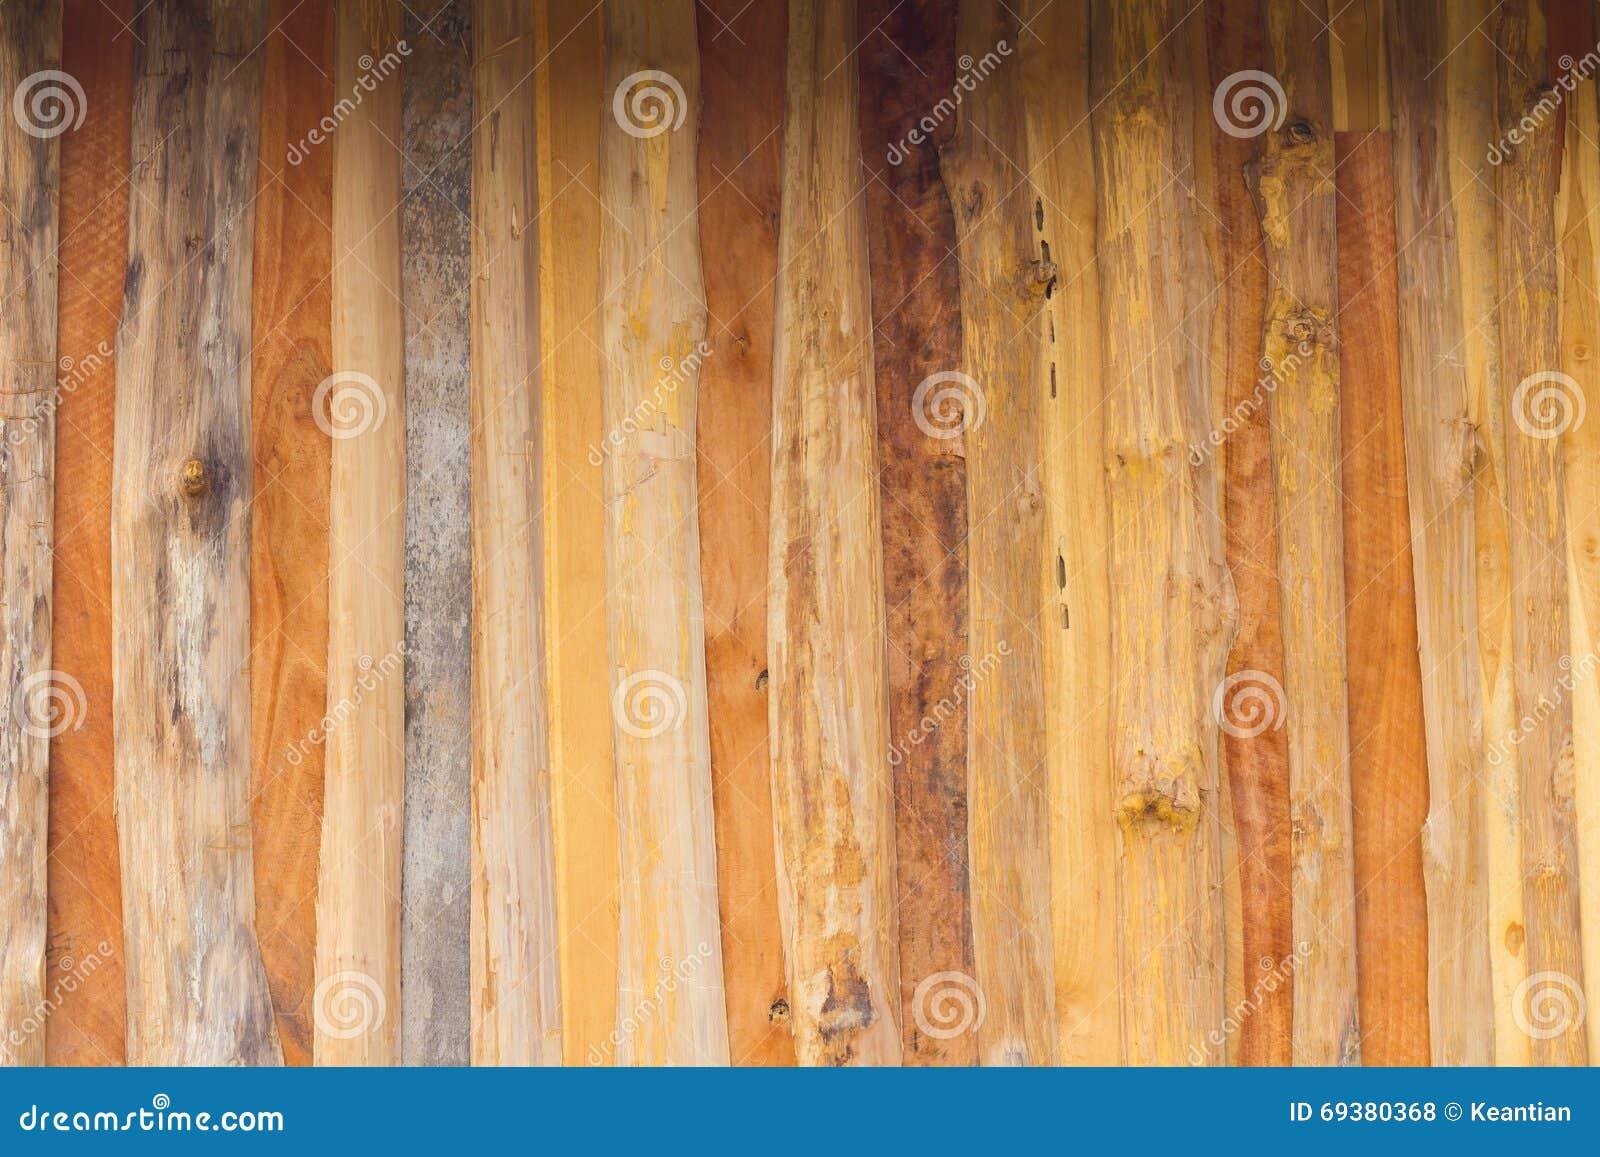 Famous Vintage Wood Wall Art Festooning - Art & Wall Decor ...